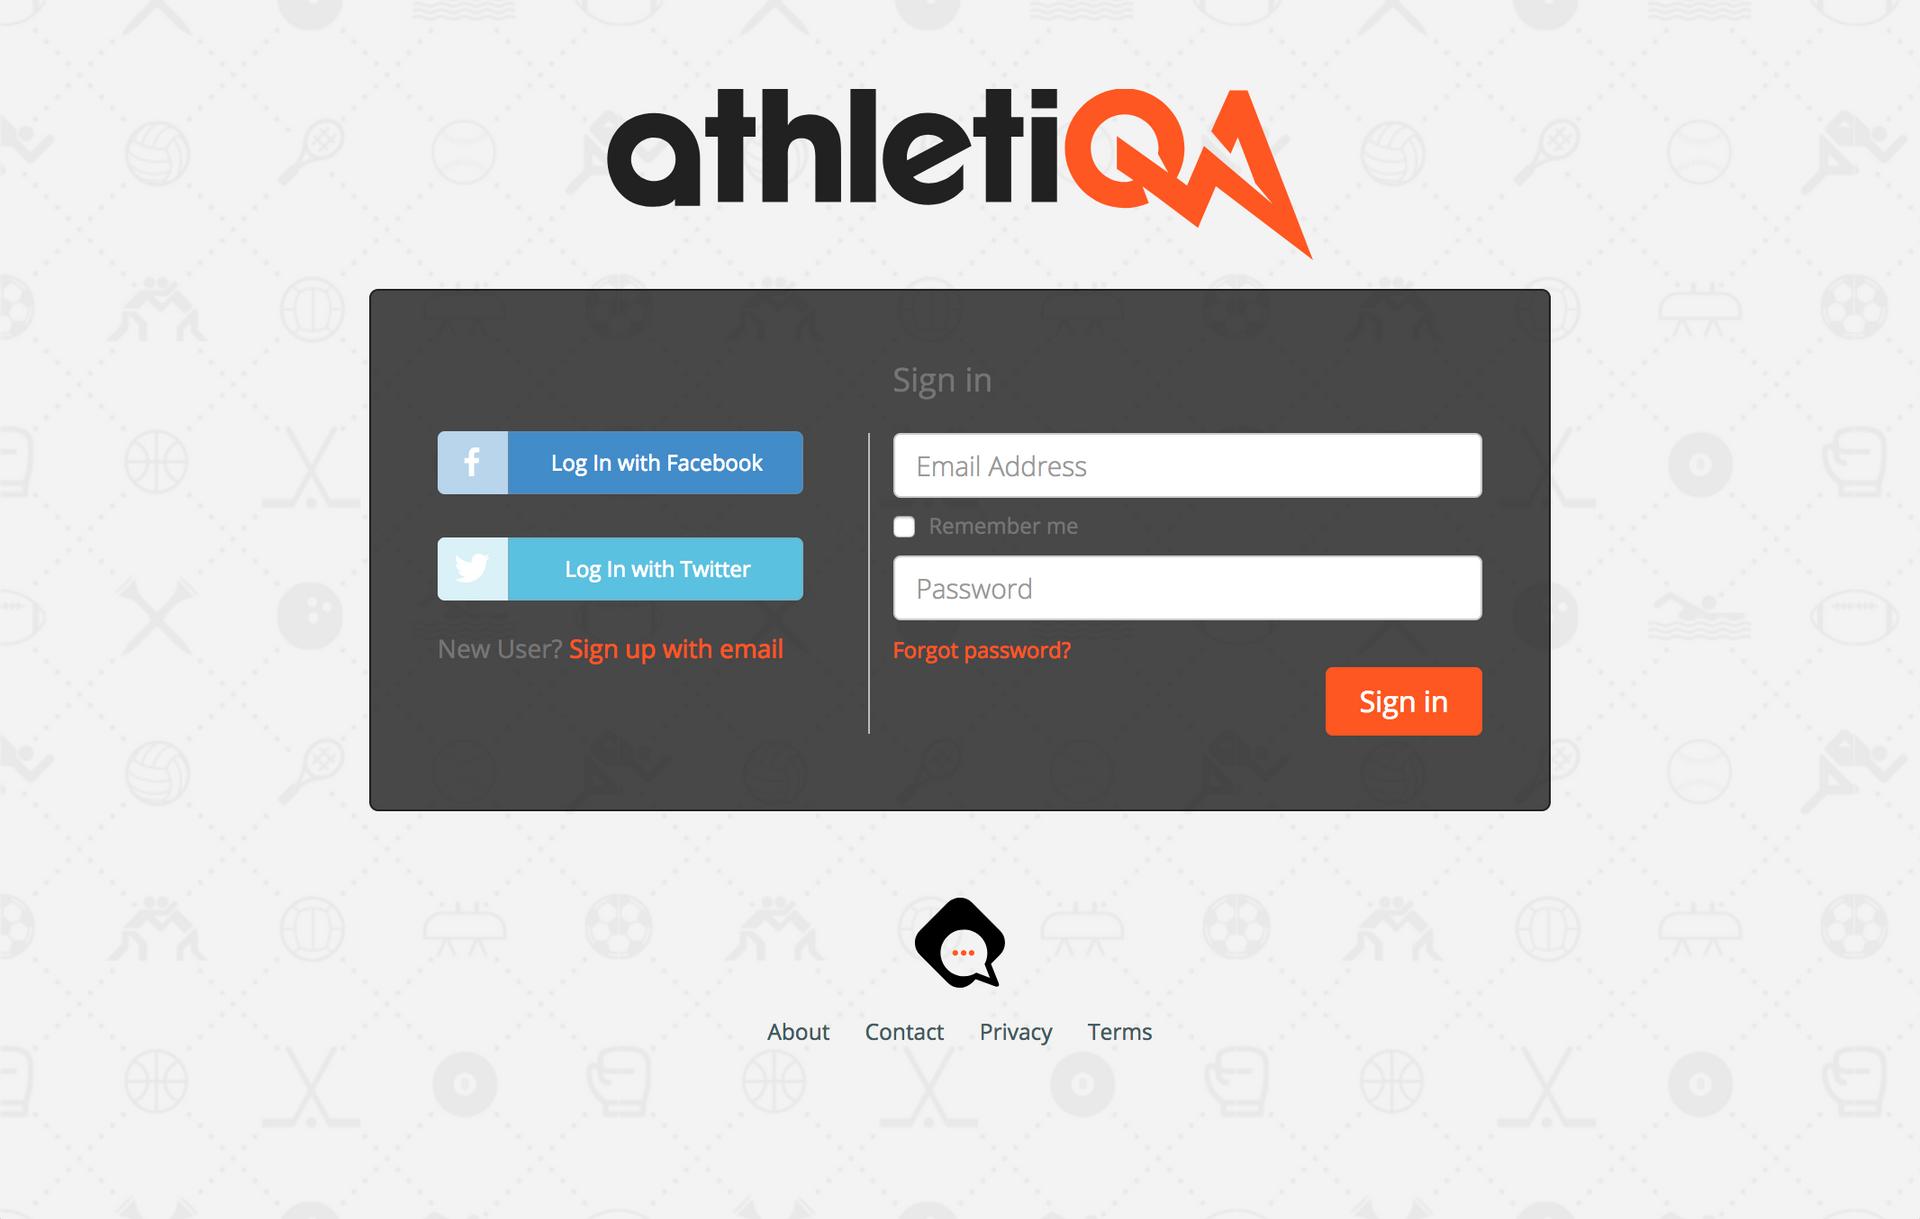 AthletiQA